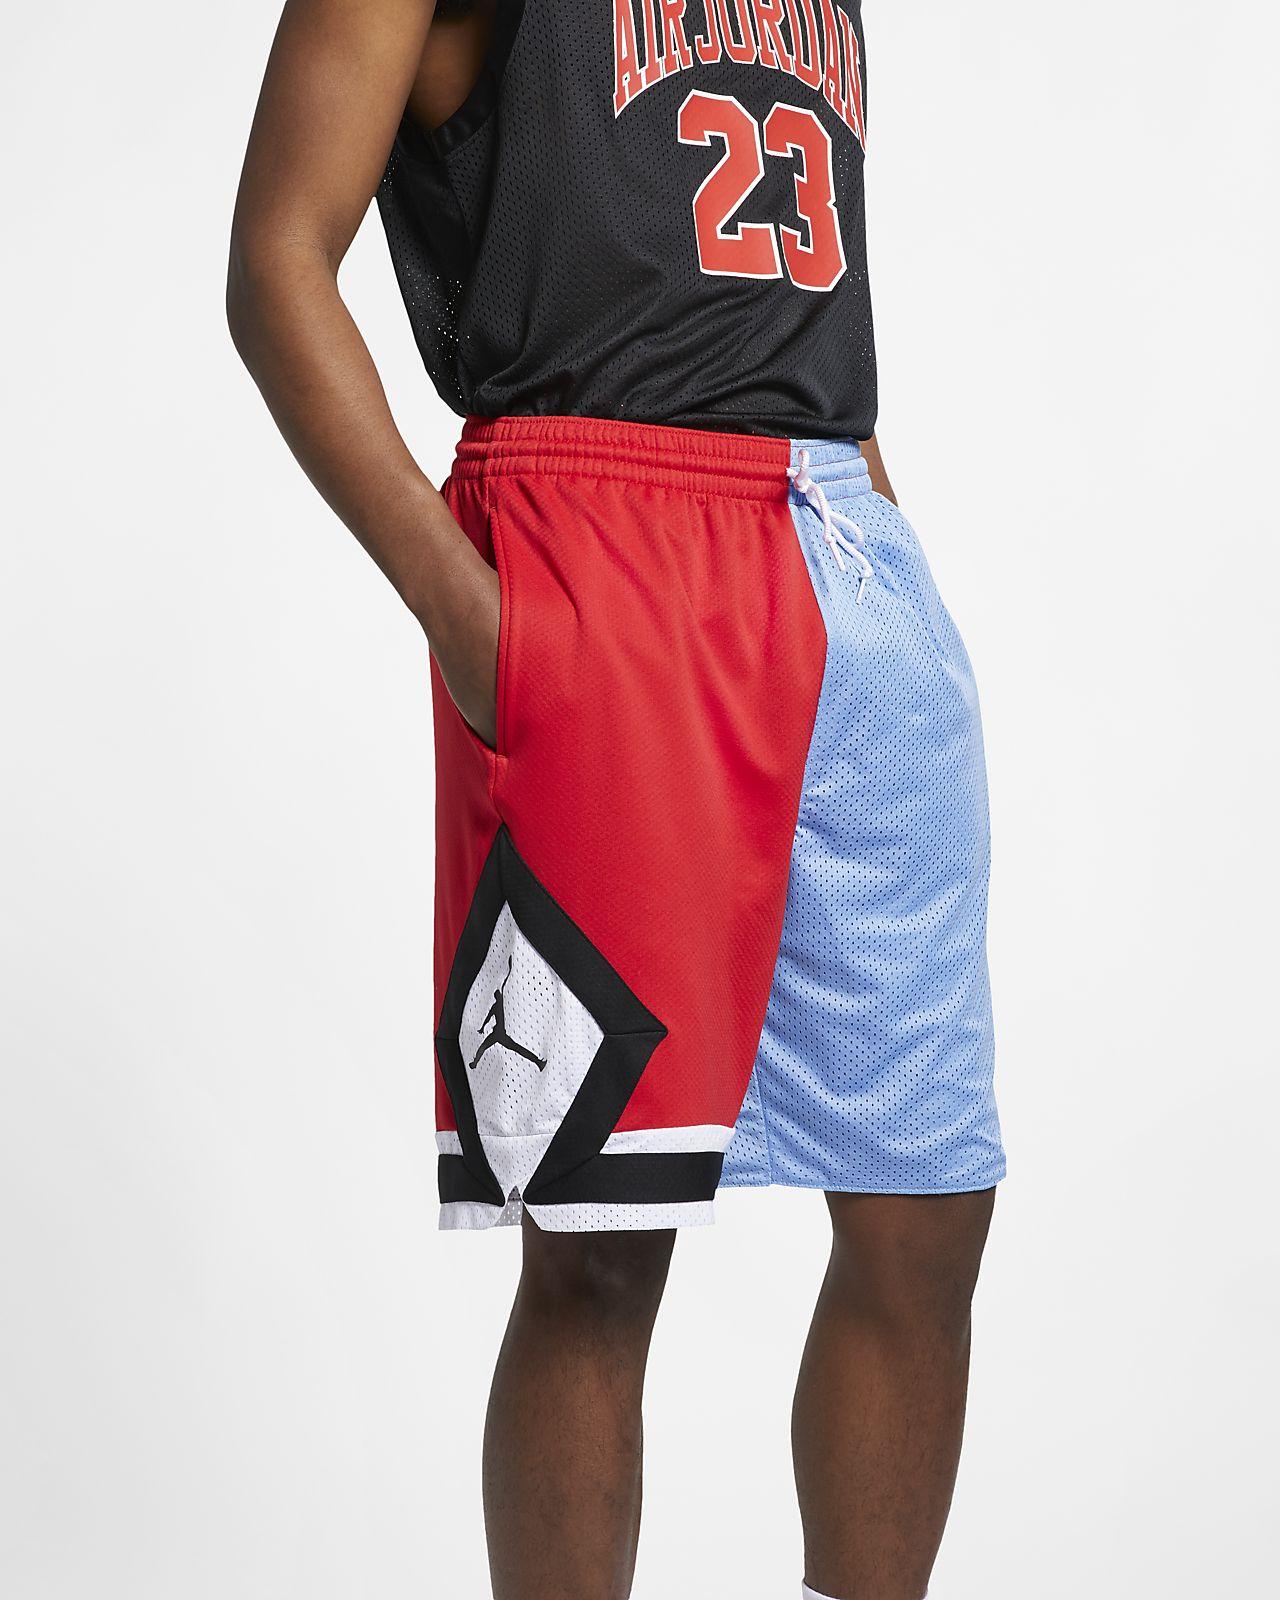 Jordan DNA Distorted Men's Basketball Shorts